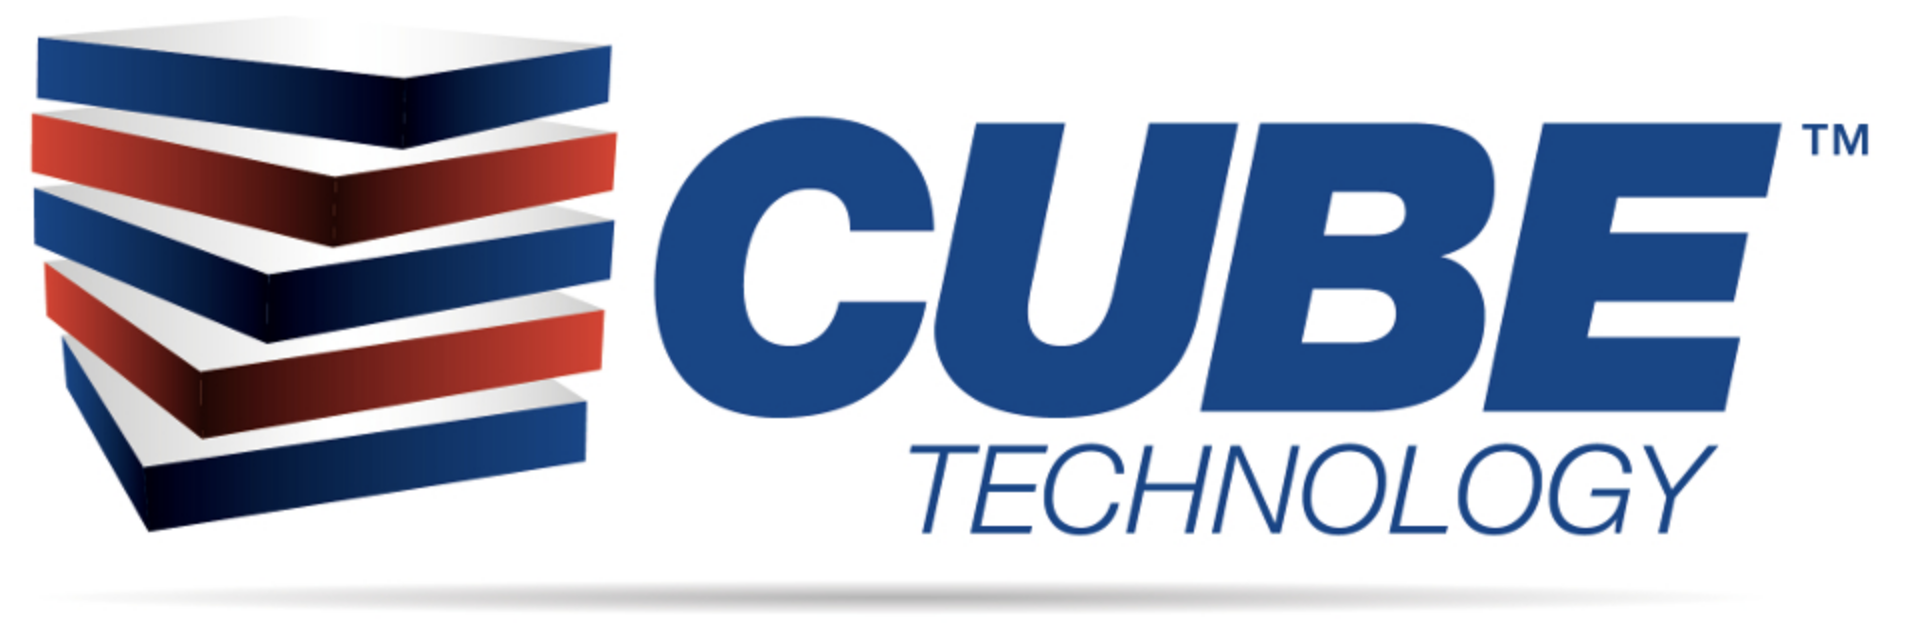 Robopac Cube Technology